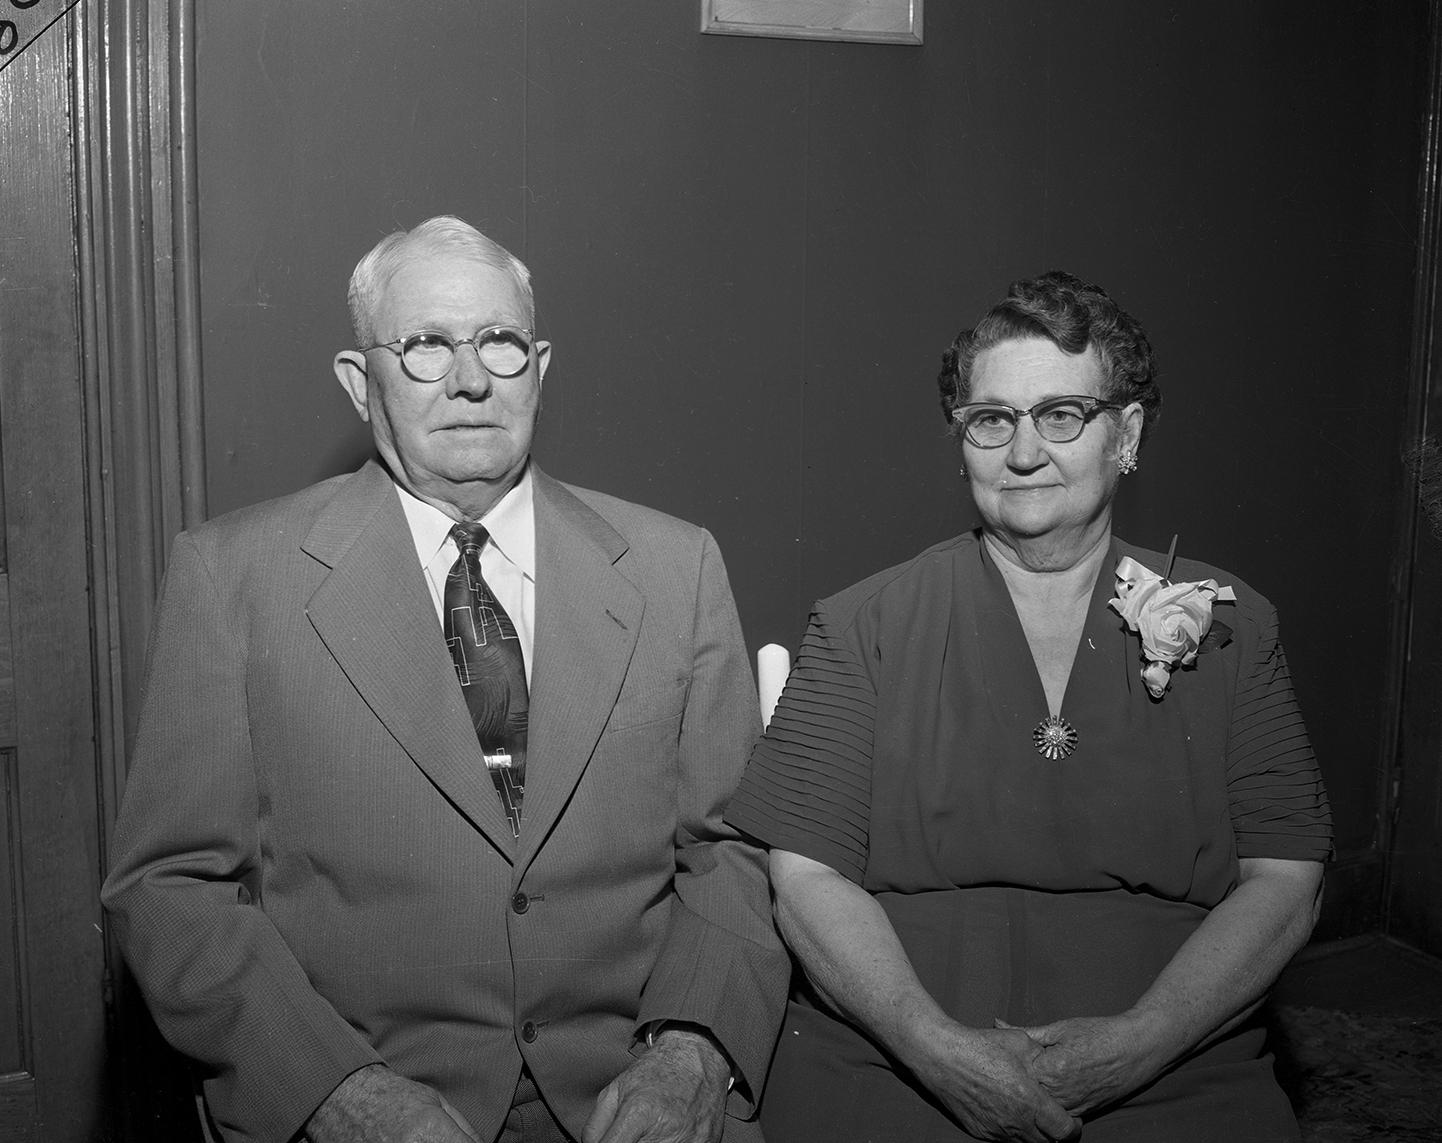 Anniversary portrait, May 3, 1954